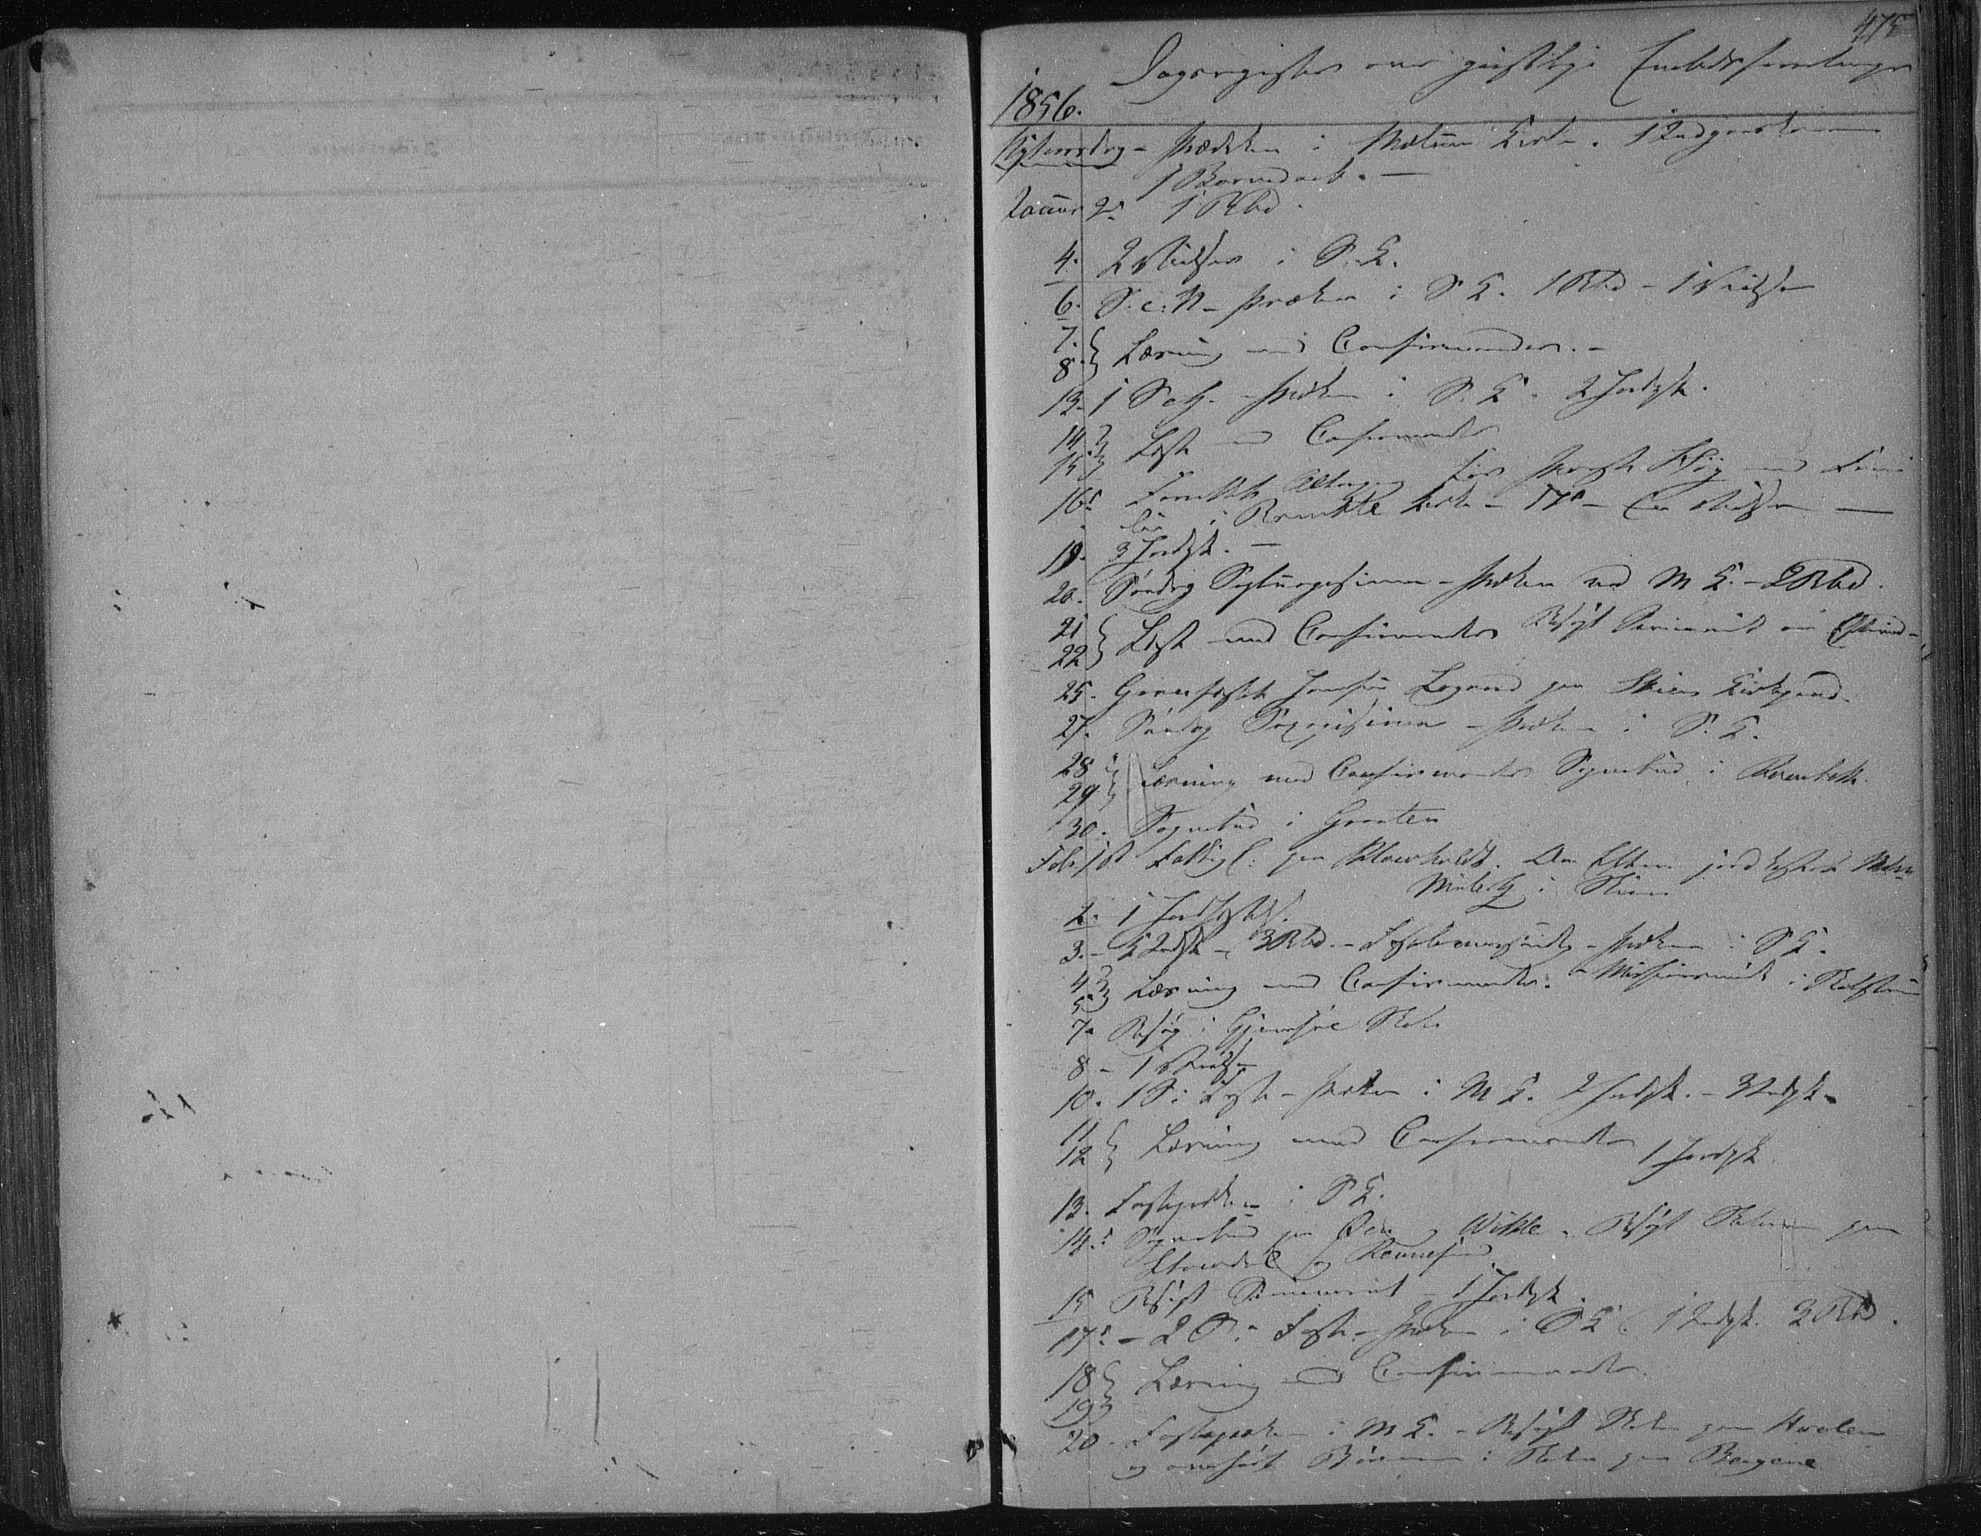 SAKO, Solum kirkebøker, F/Fa/L0007: Ministerialbok nr. I 7, 1856-1864, s. 475